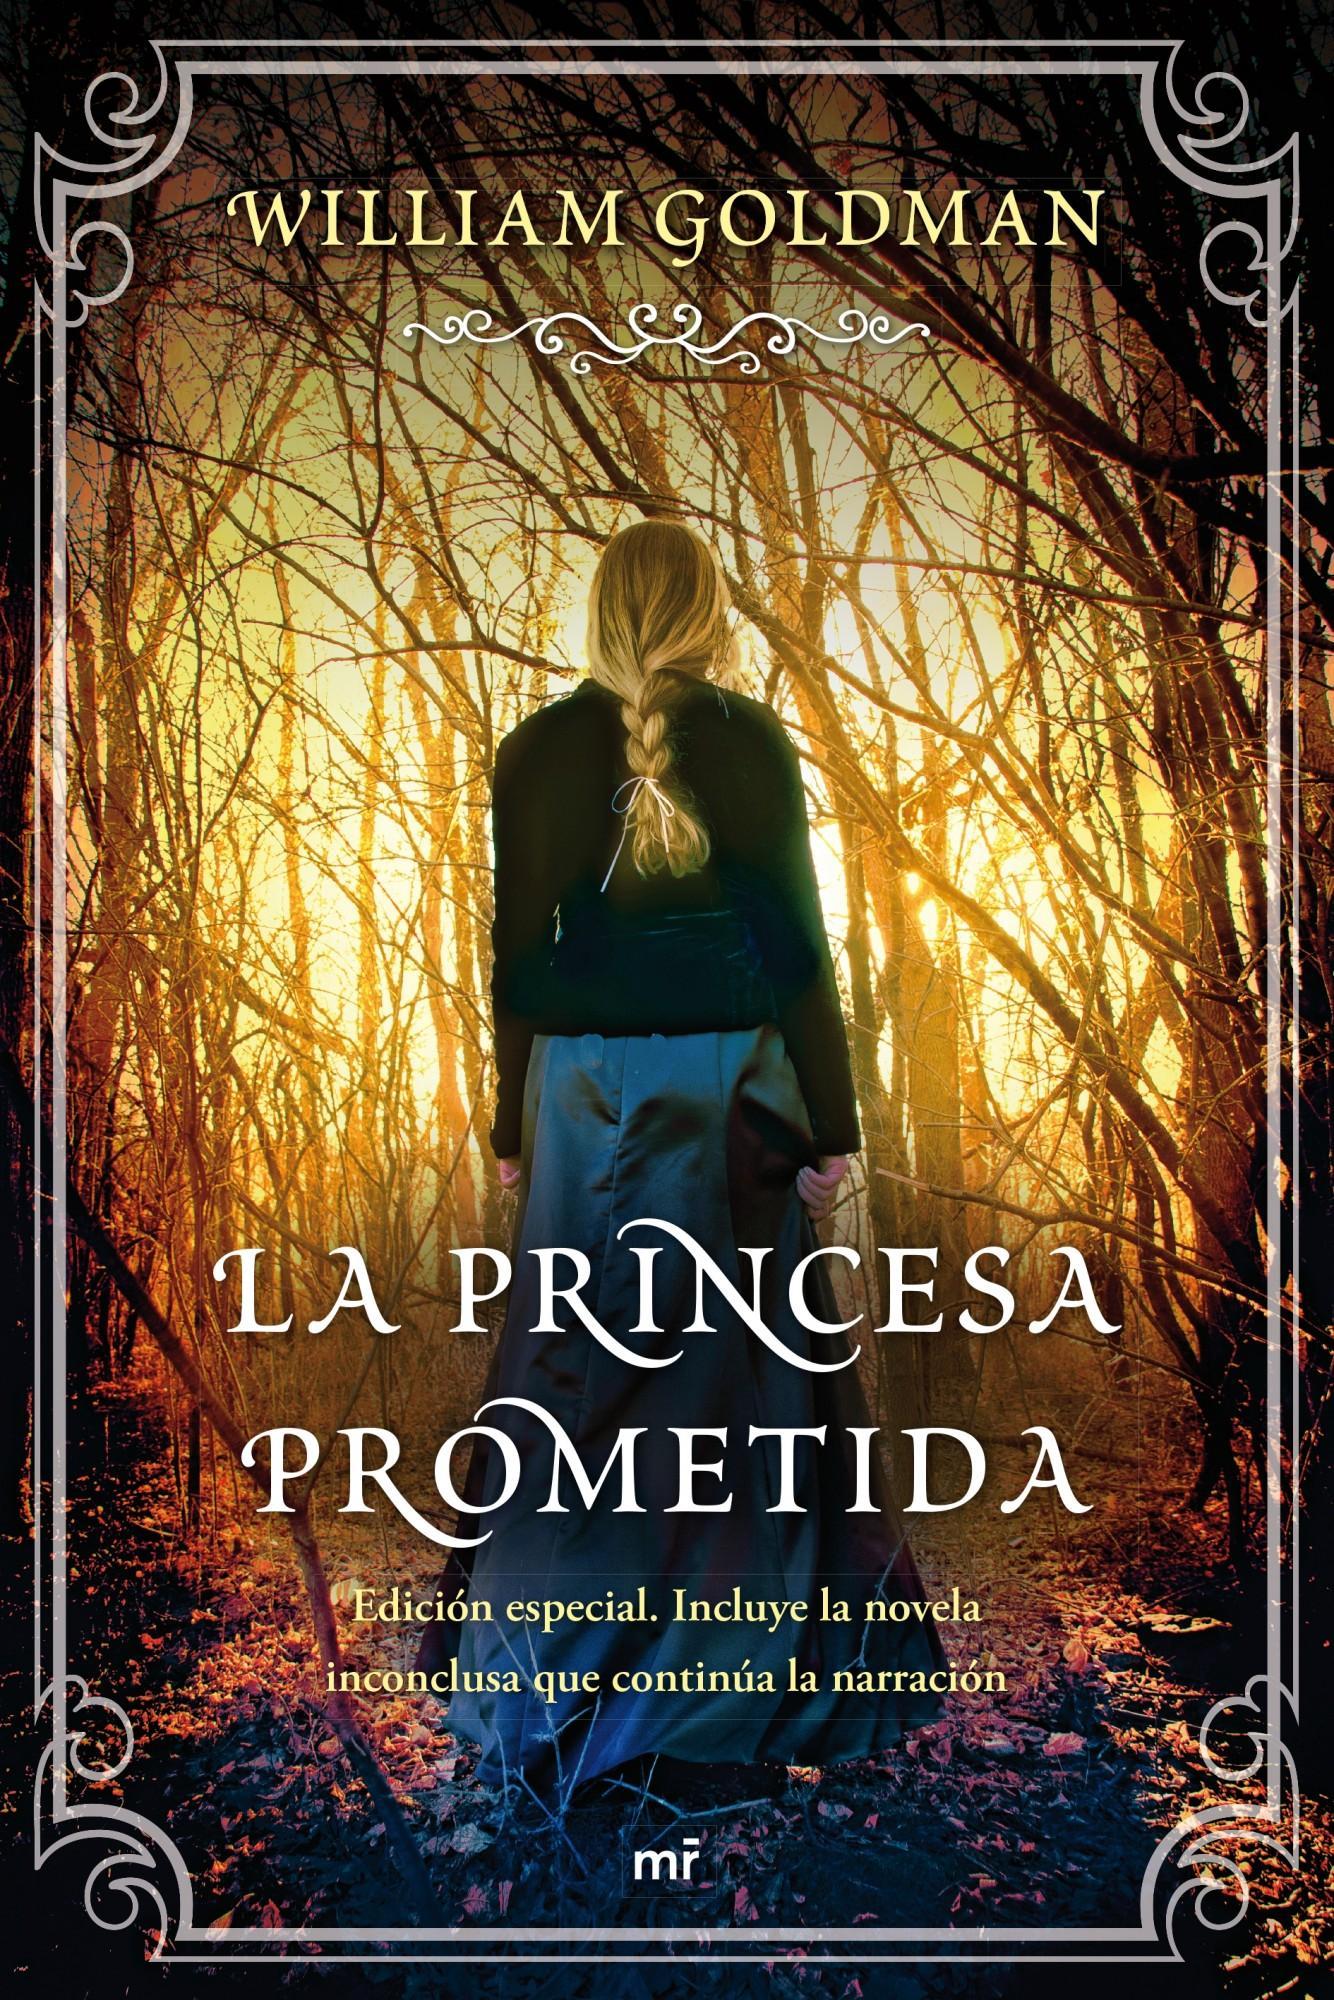 62. The Princess Bride